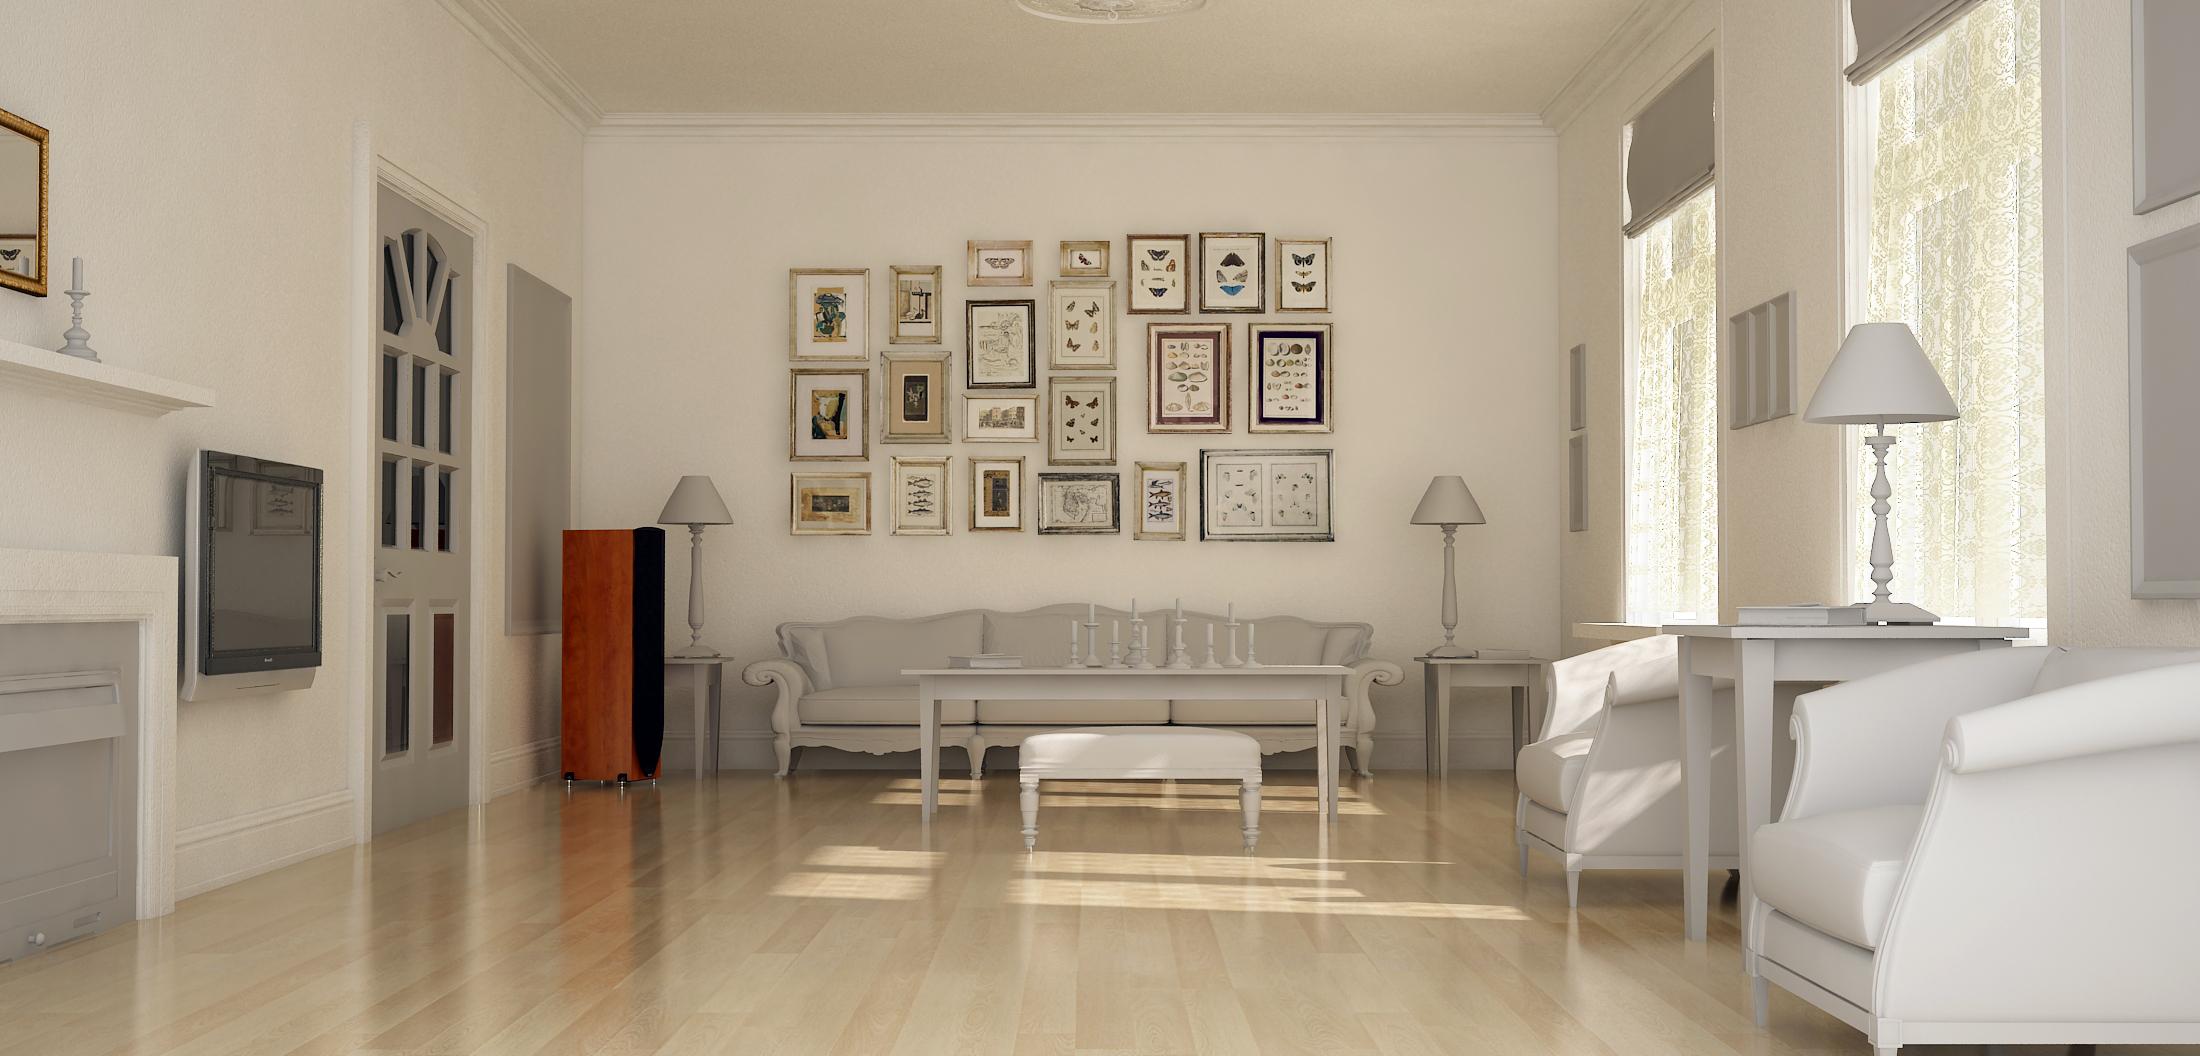 Infoarquitectura-Interior-Classic Dinning Room-217xg.jpg